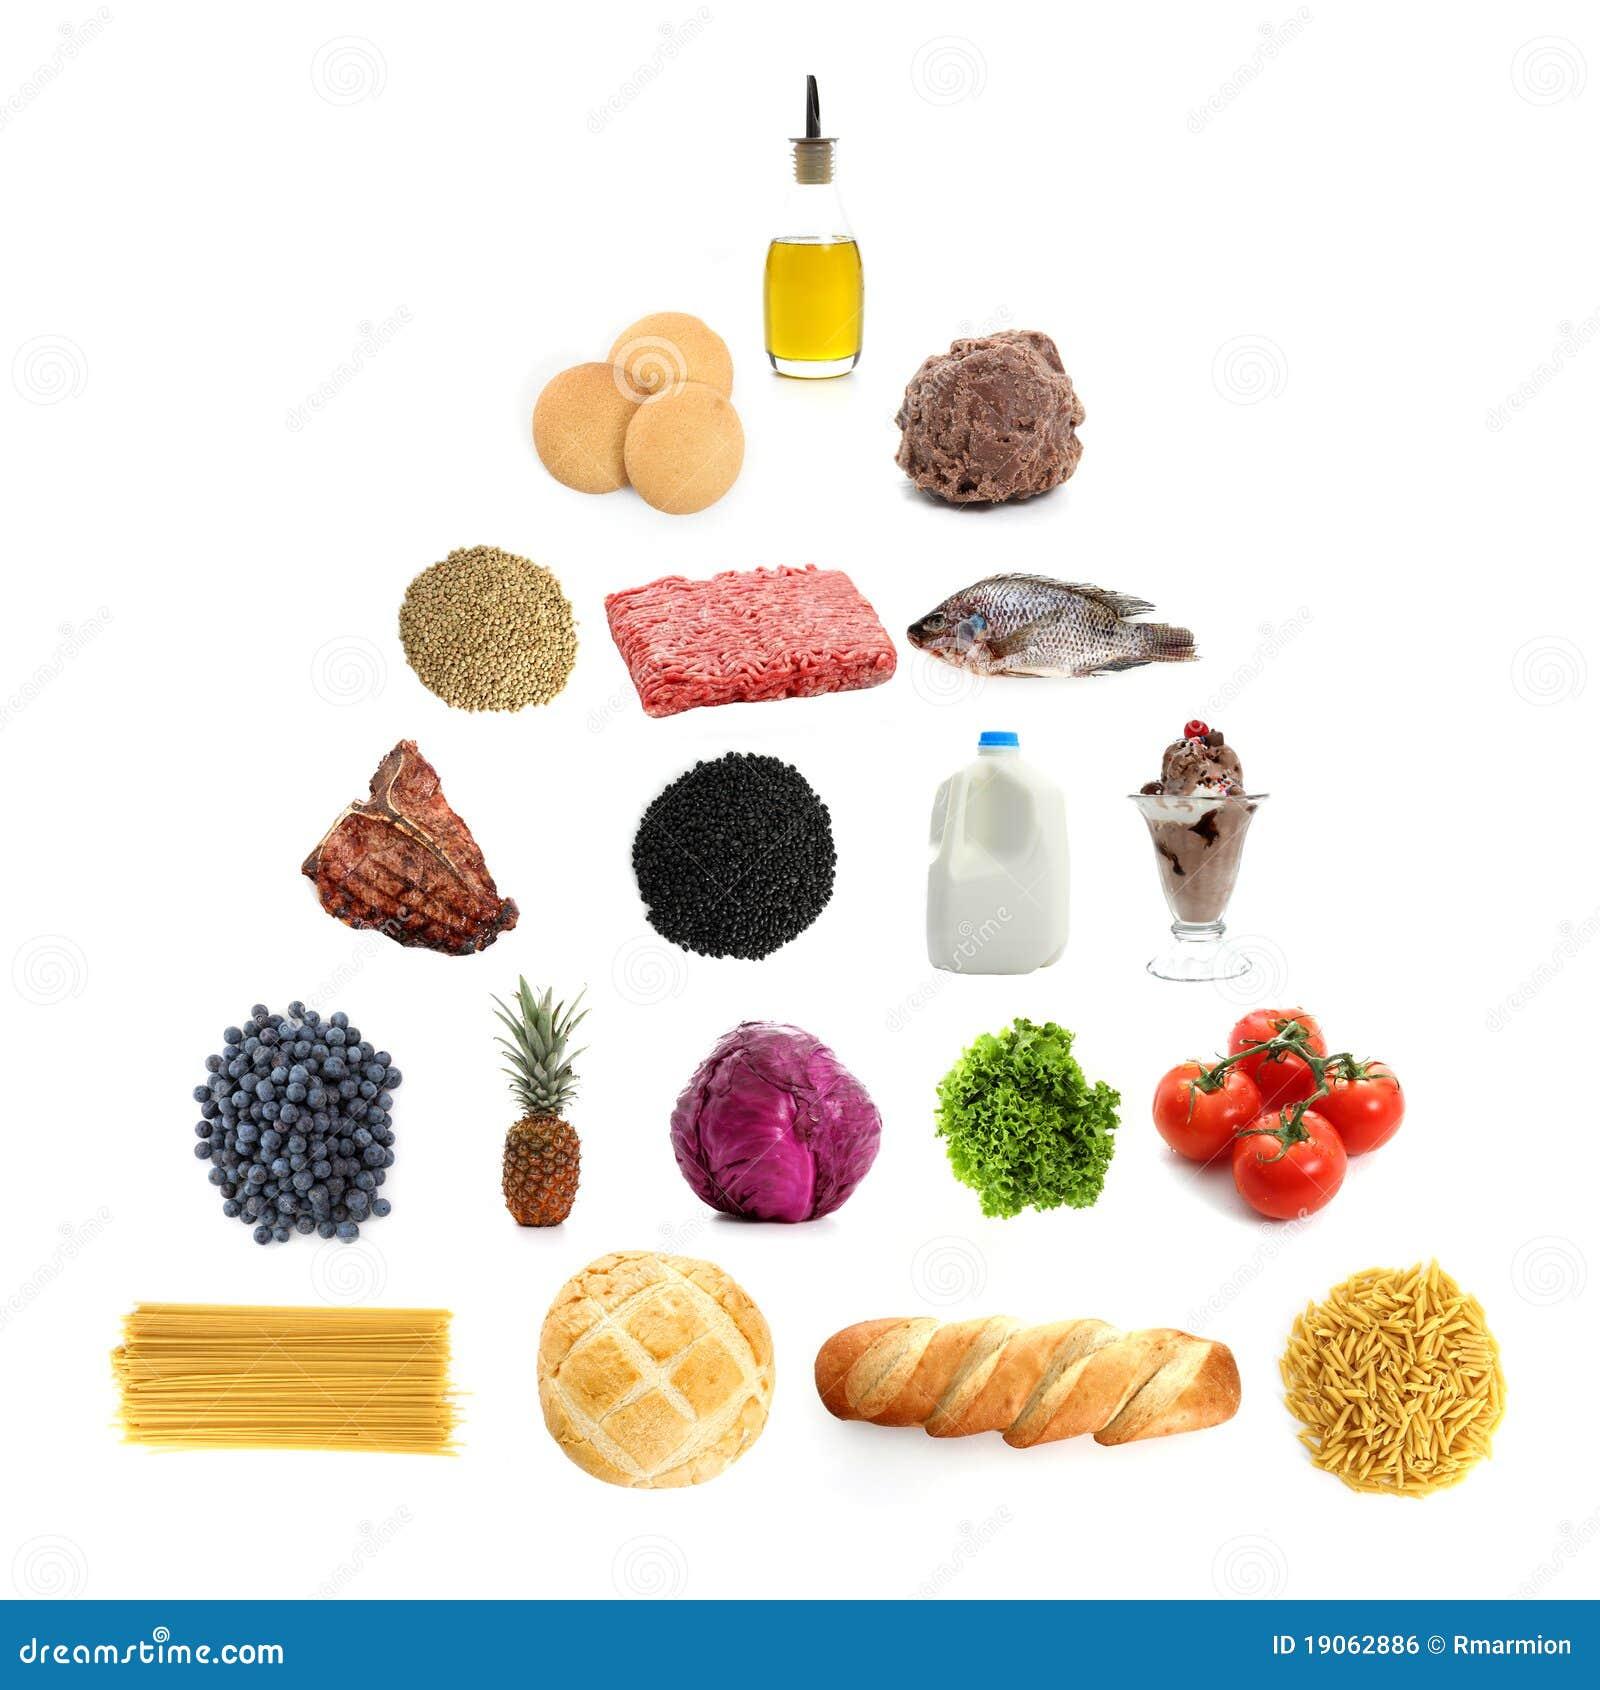 Pyramide de nourriture